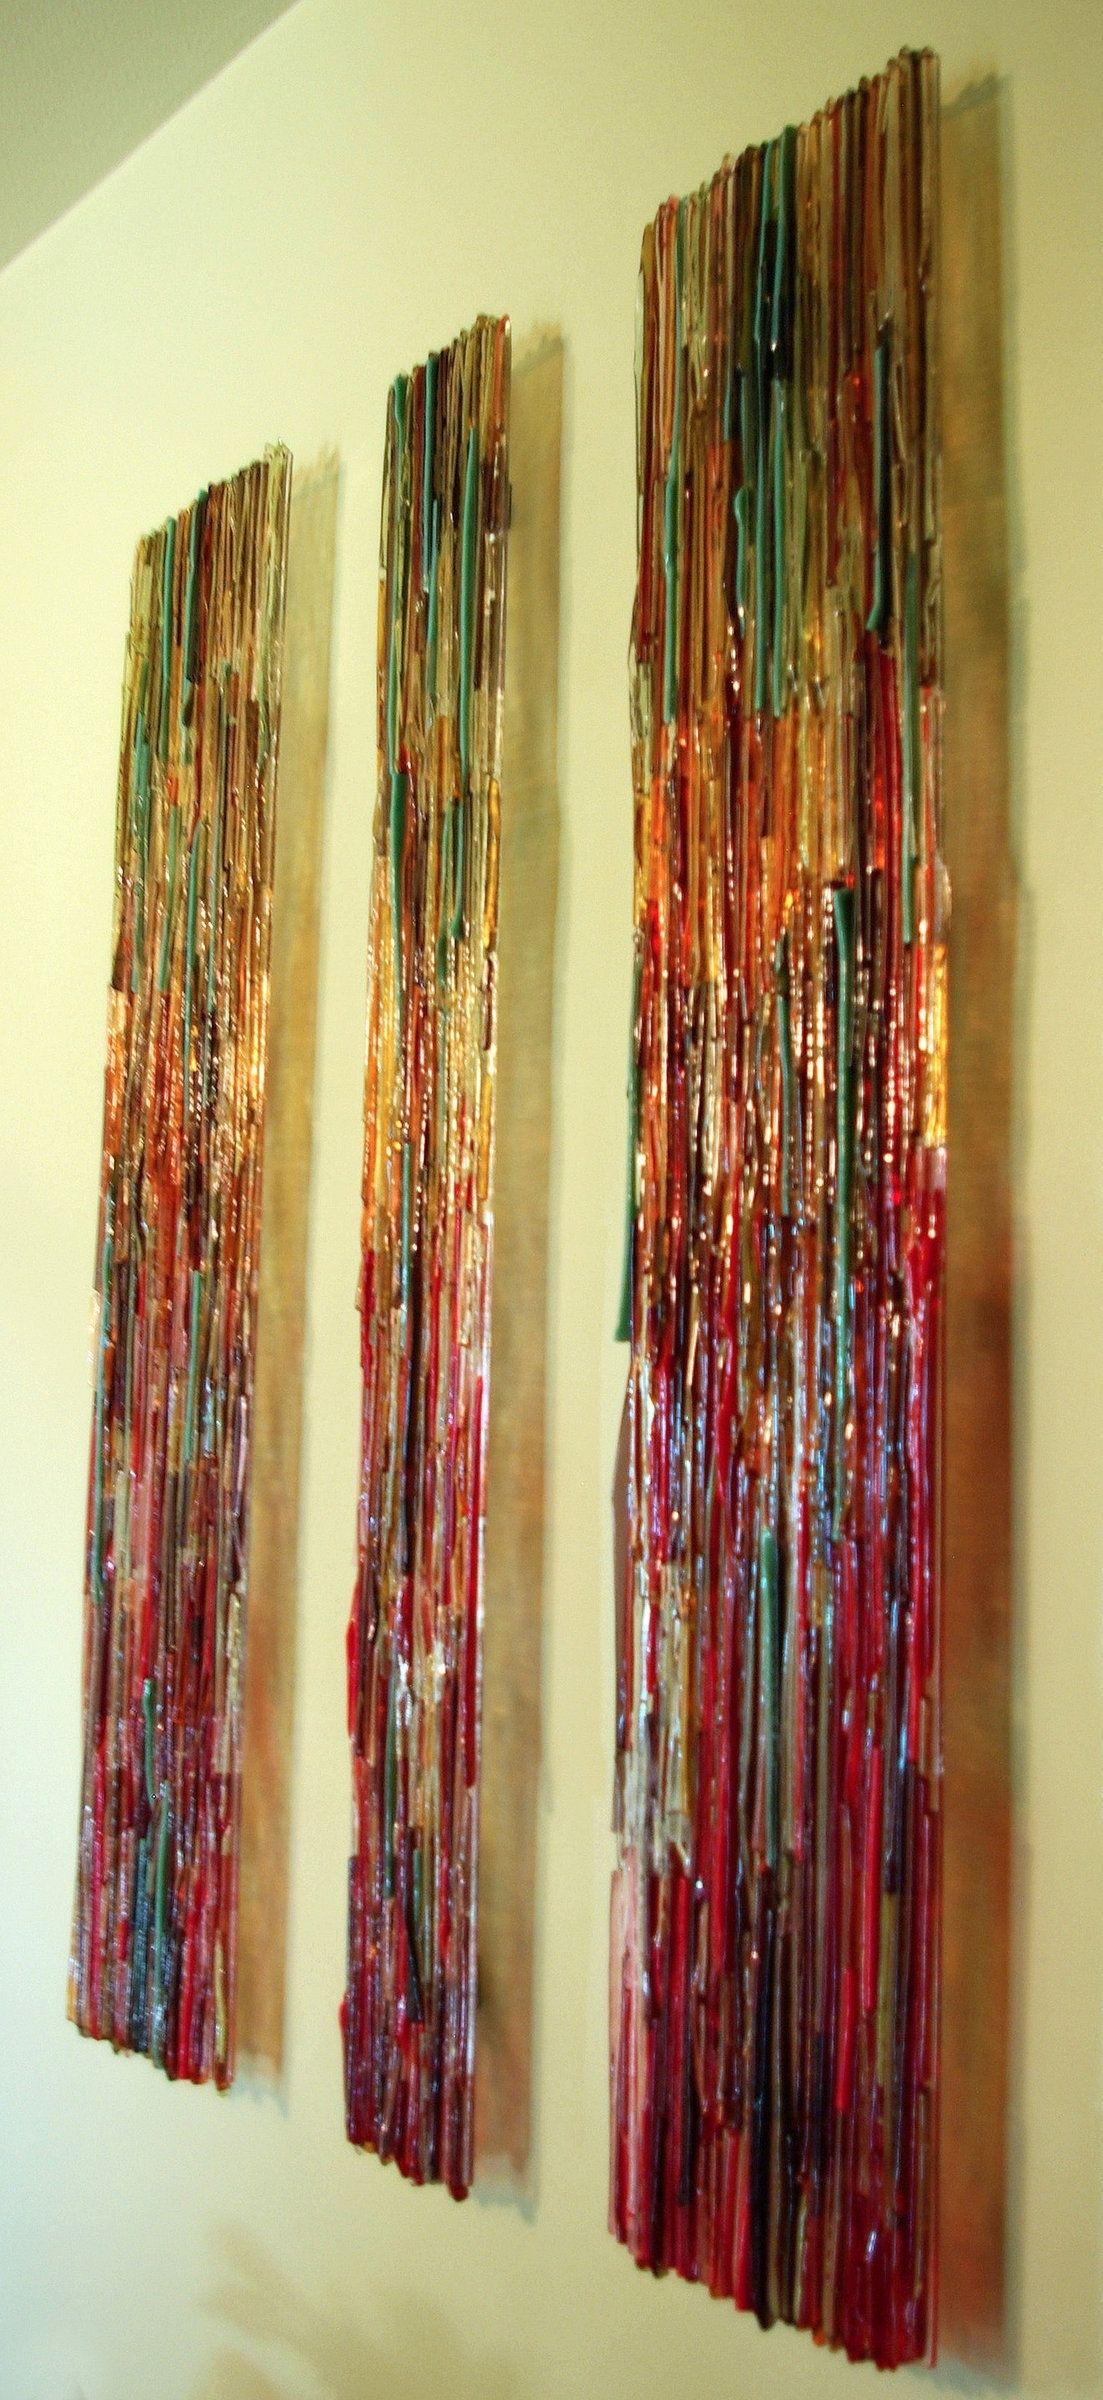 Transpire Wall Panels: Sarinda Jones: Art Glass Wall Art – Artful In Best And Newest Wall Art Panels (View 17 of 20)